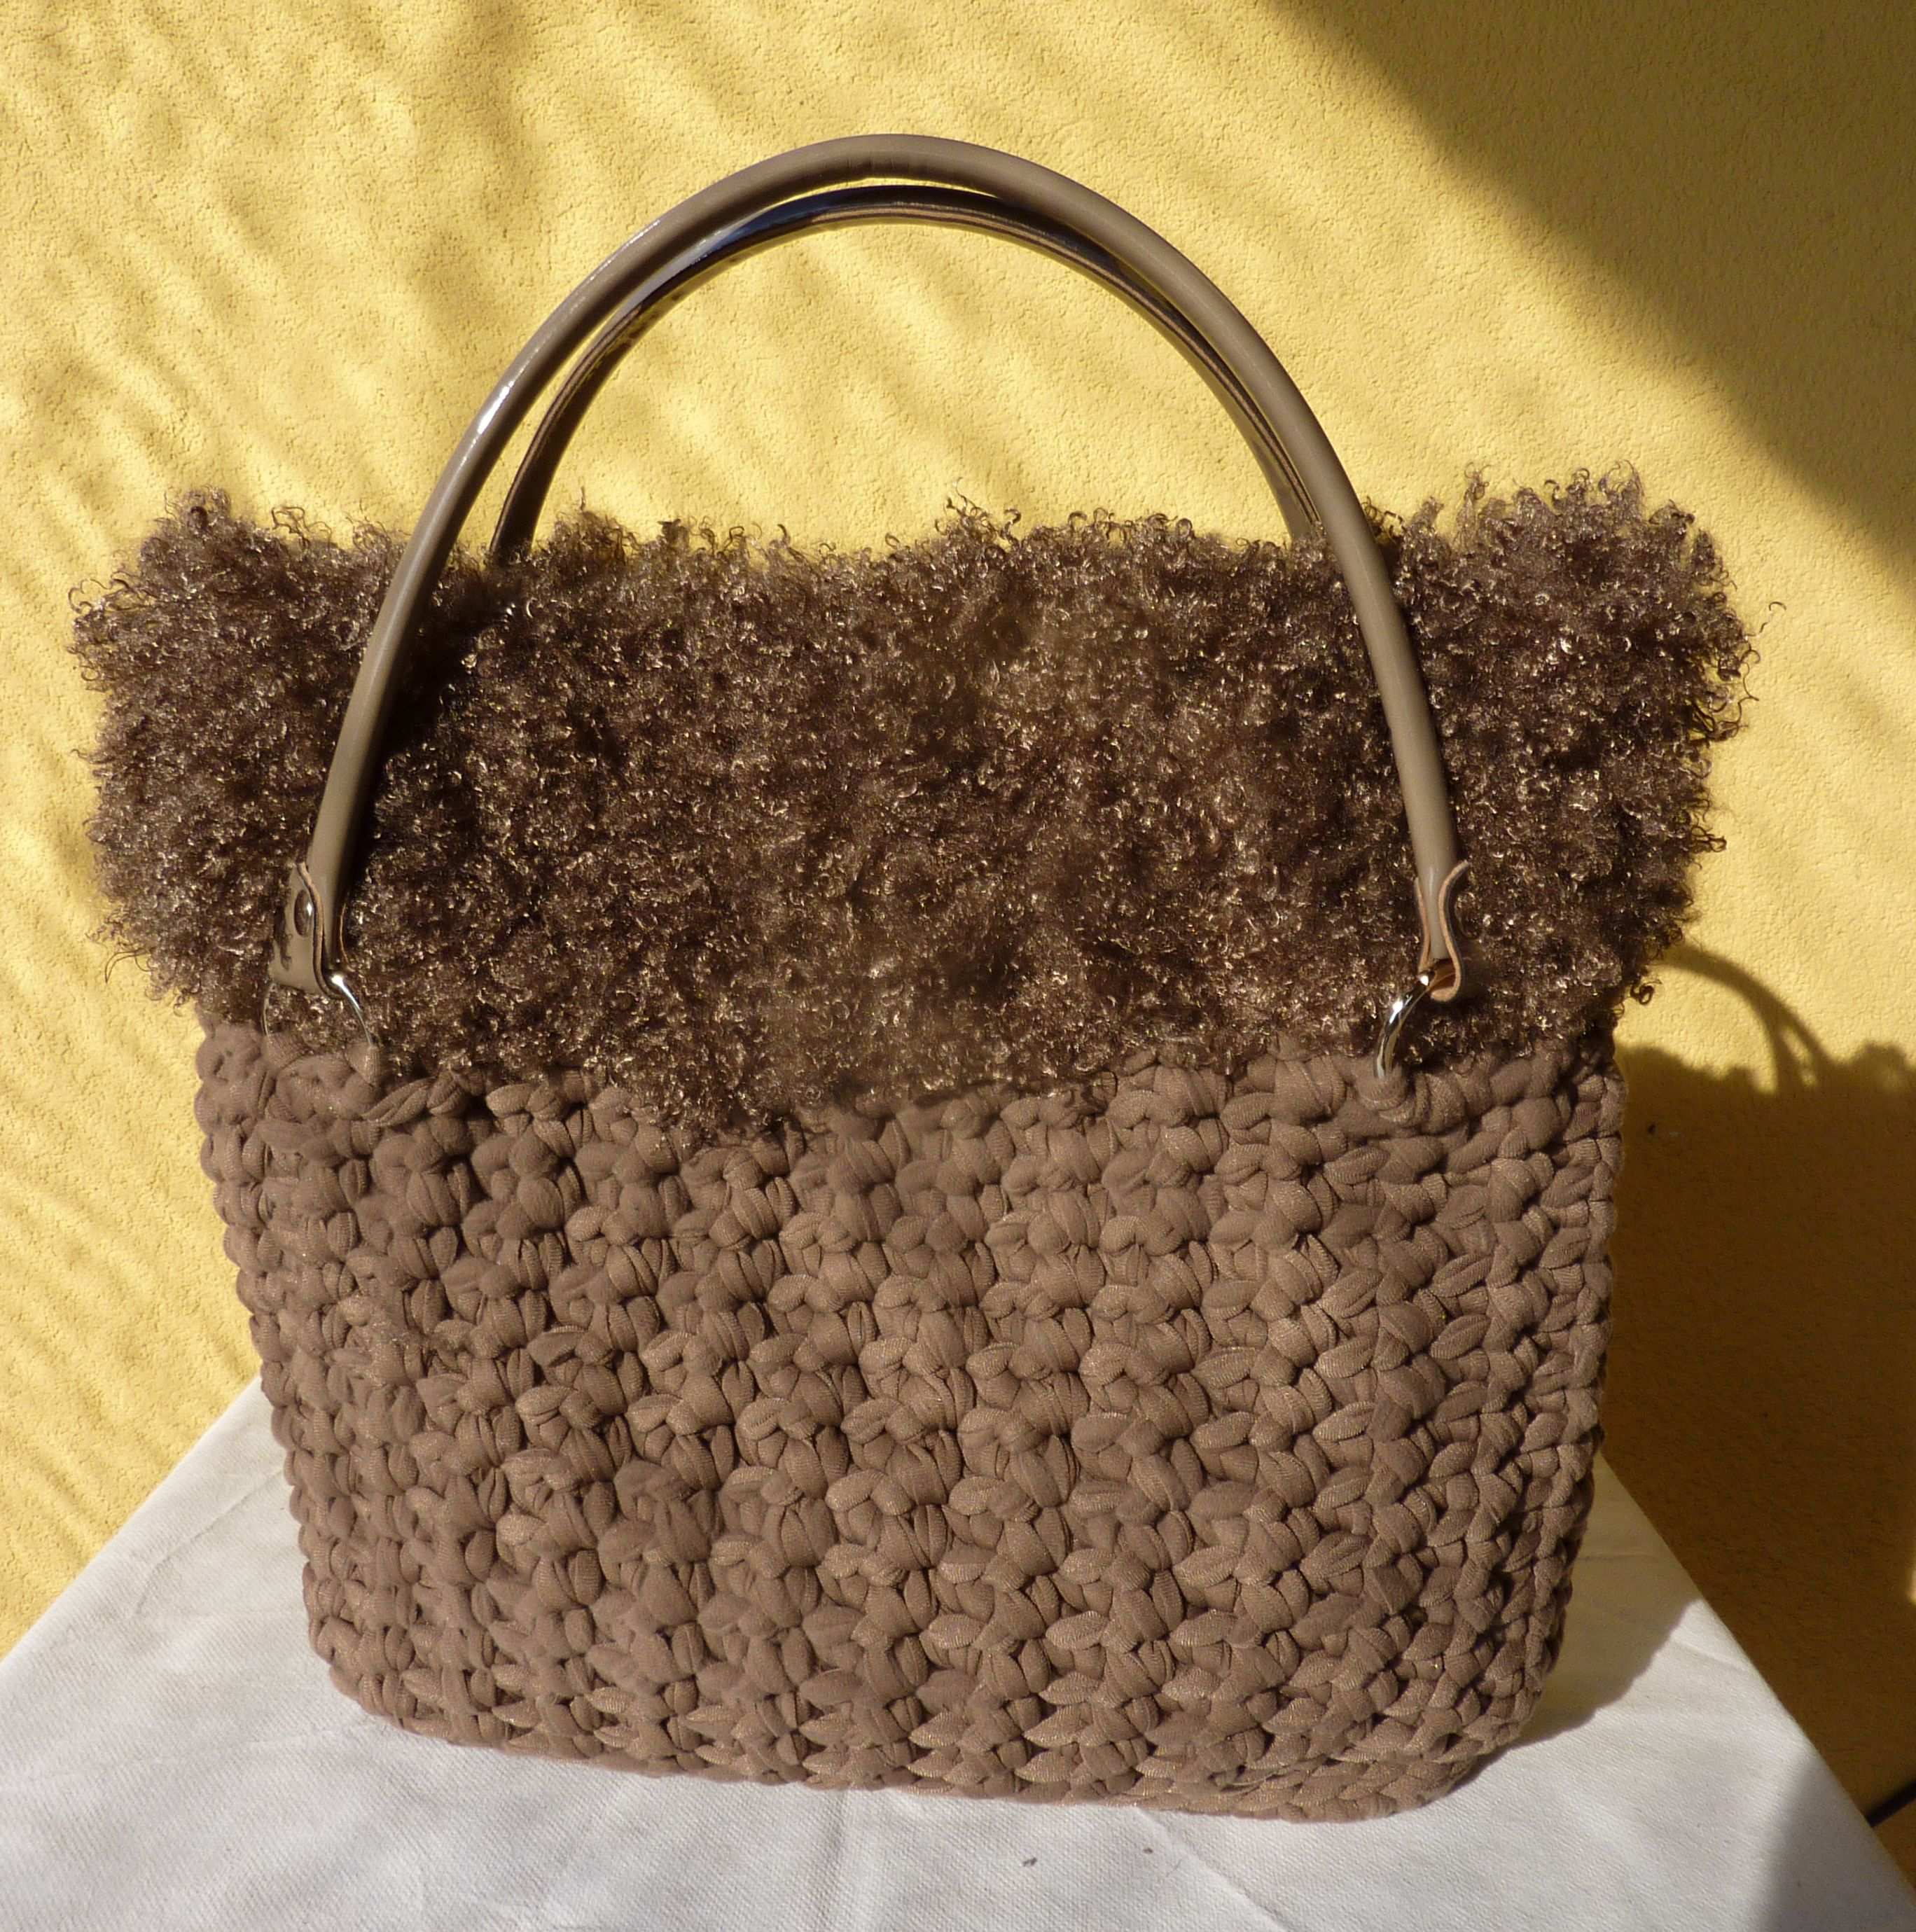 Fettuccia | Borsa fettuccia | Straw Bag e Bags